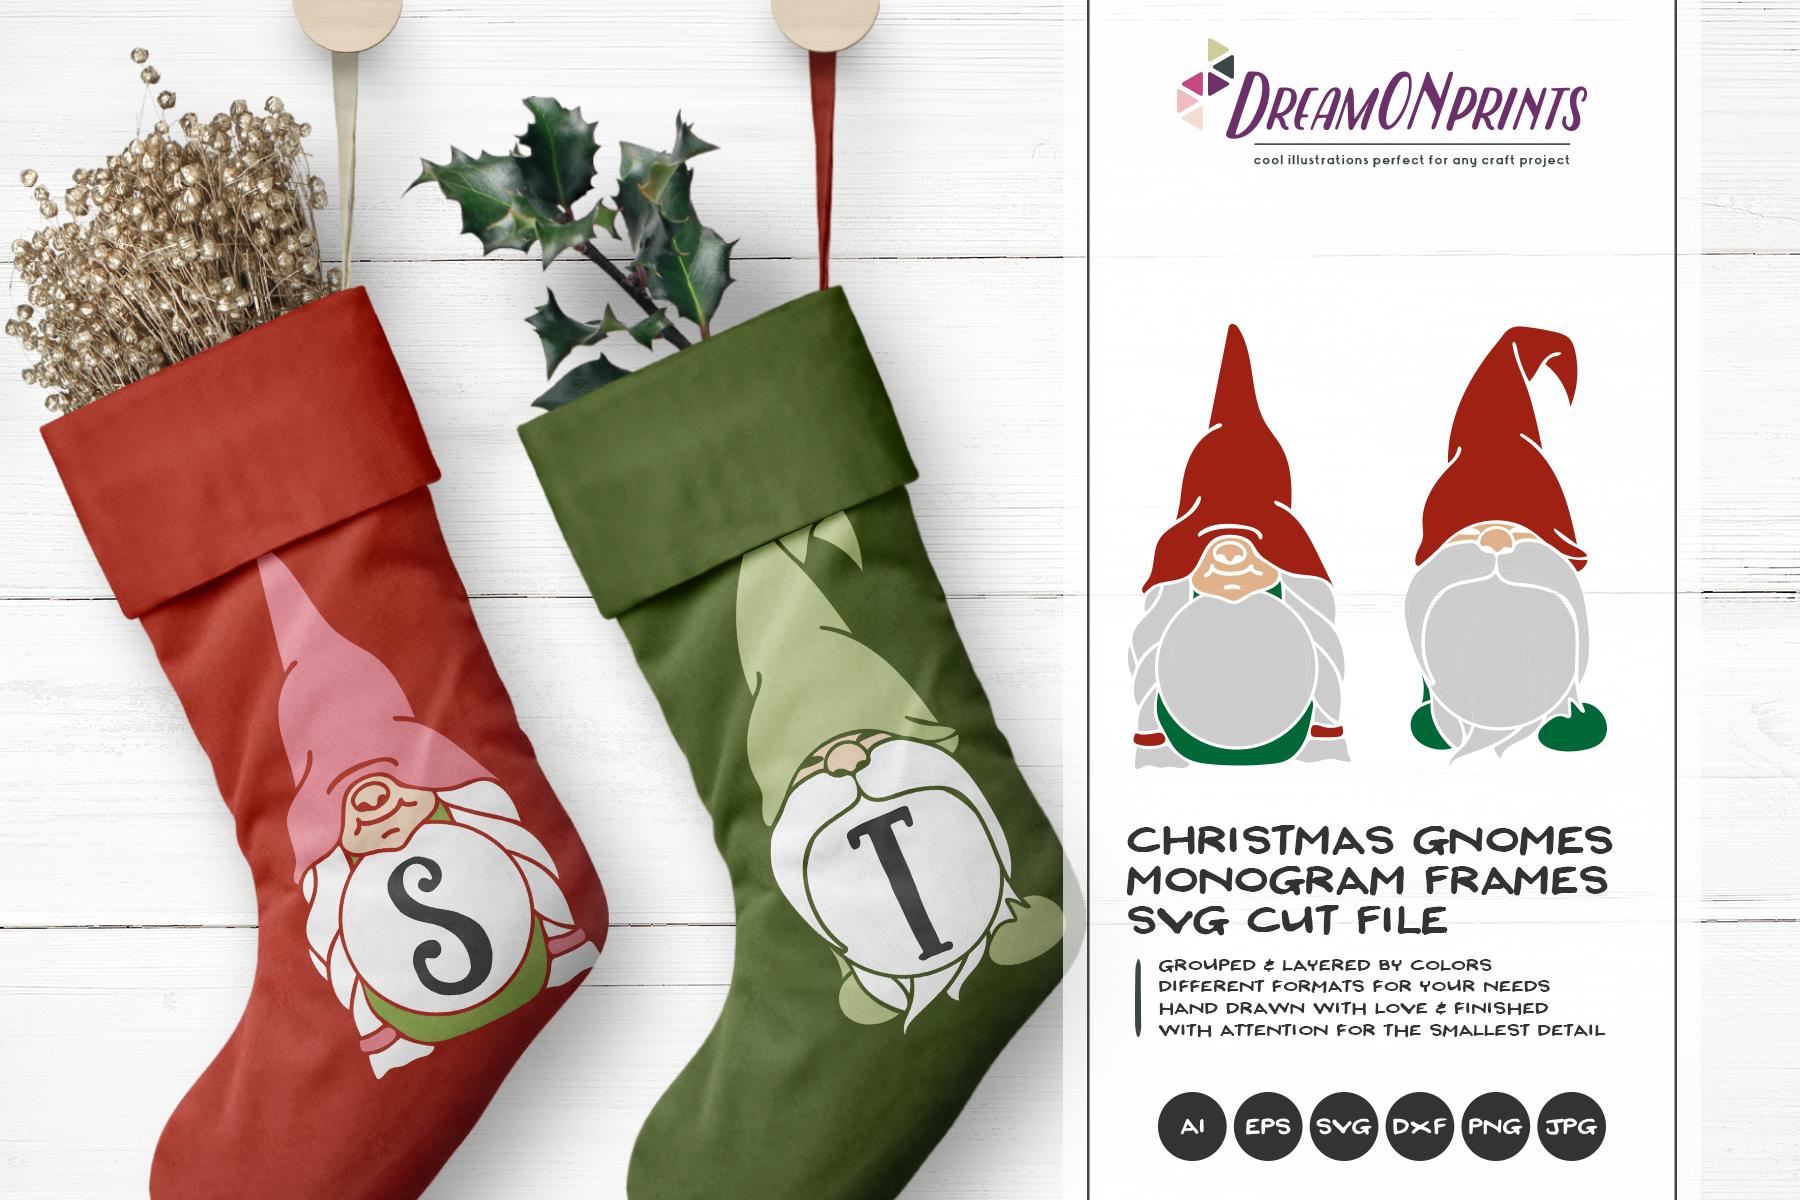 Christmas Gnomes.Monogram Frames Christmas Gnomes Svg